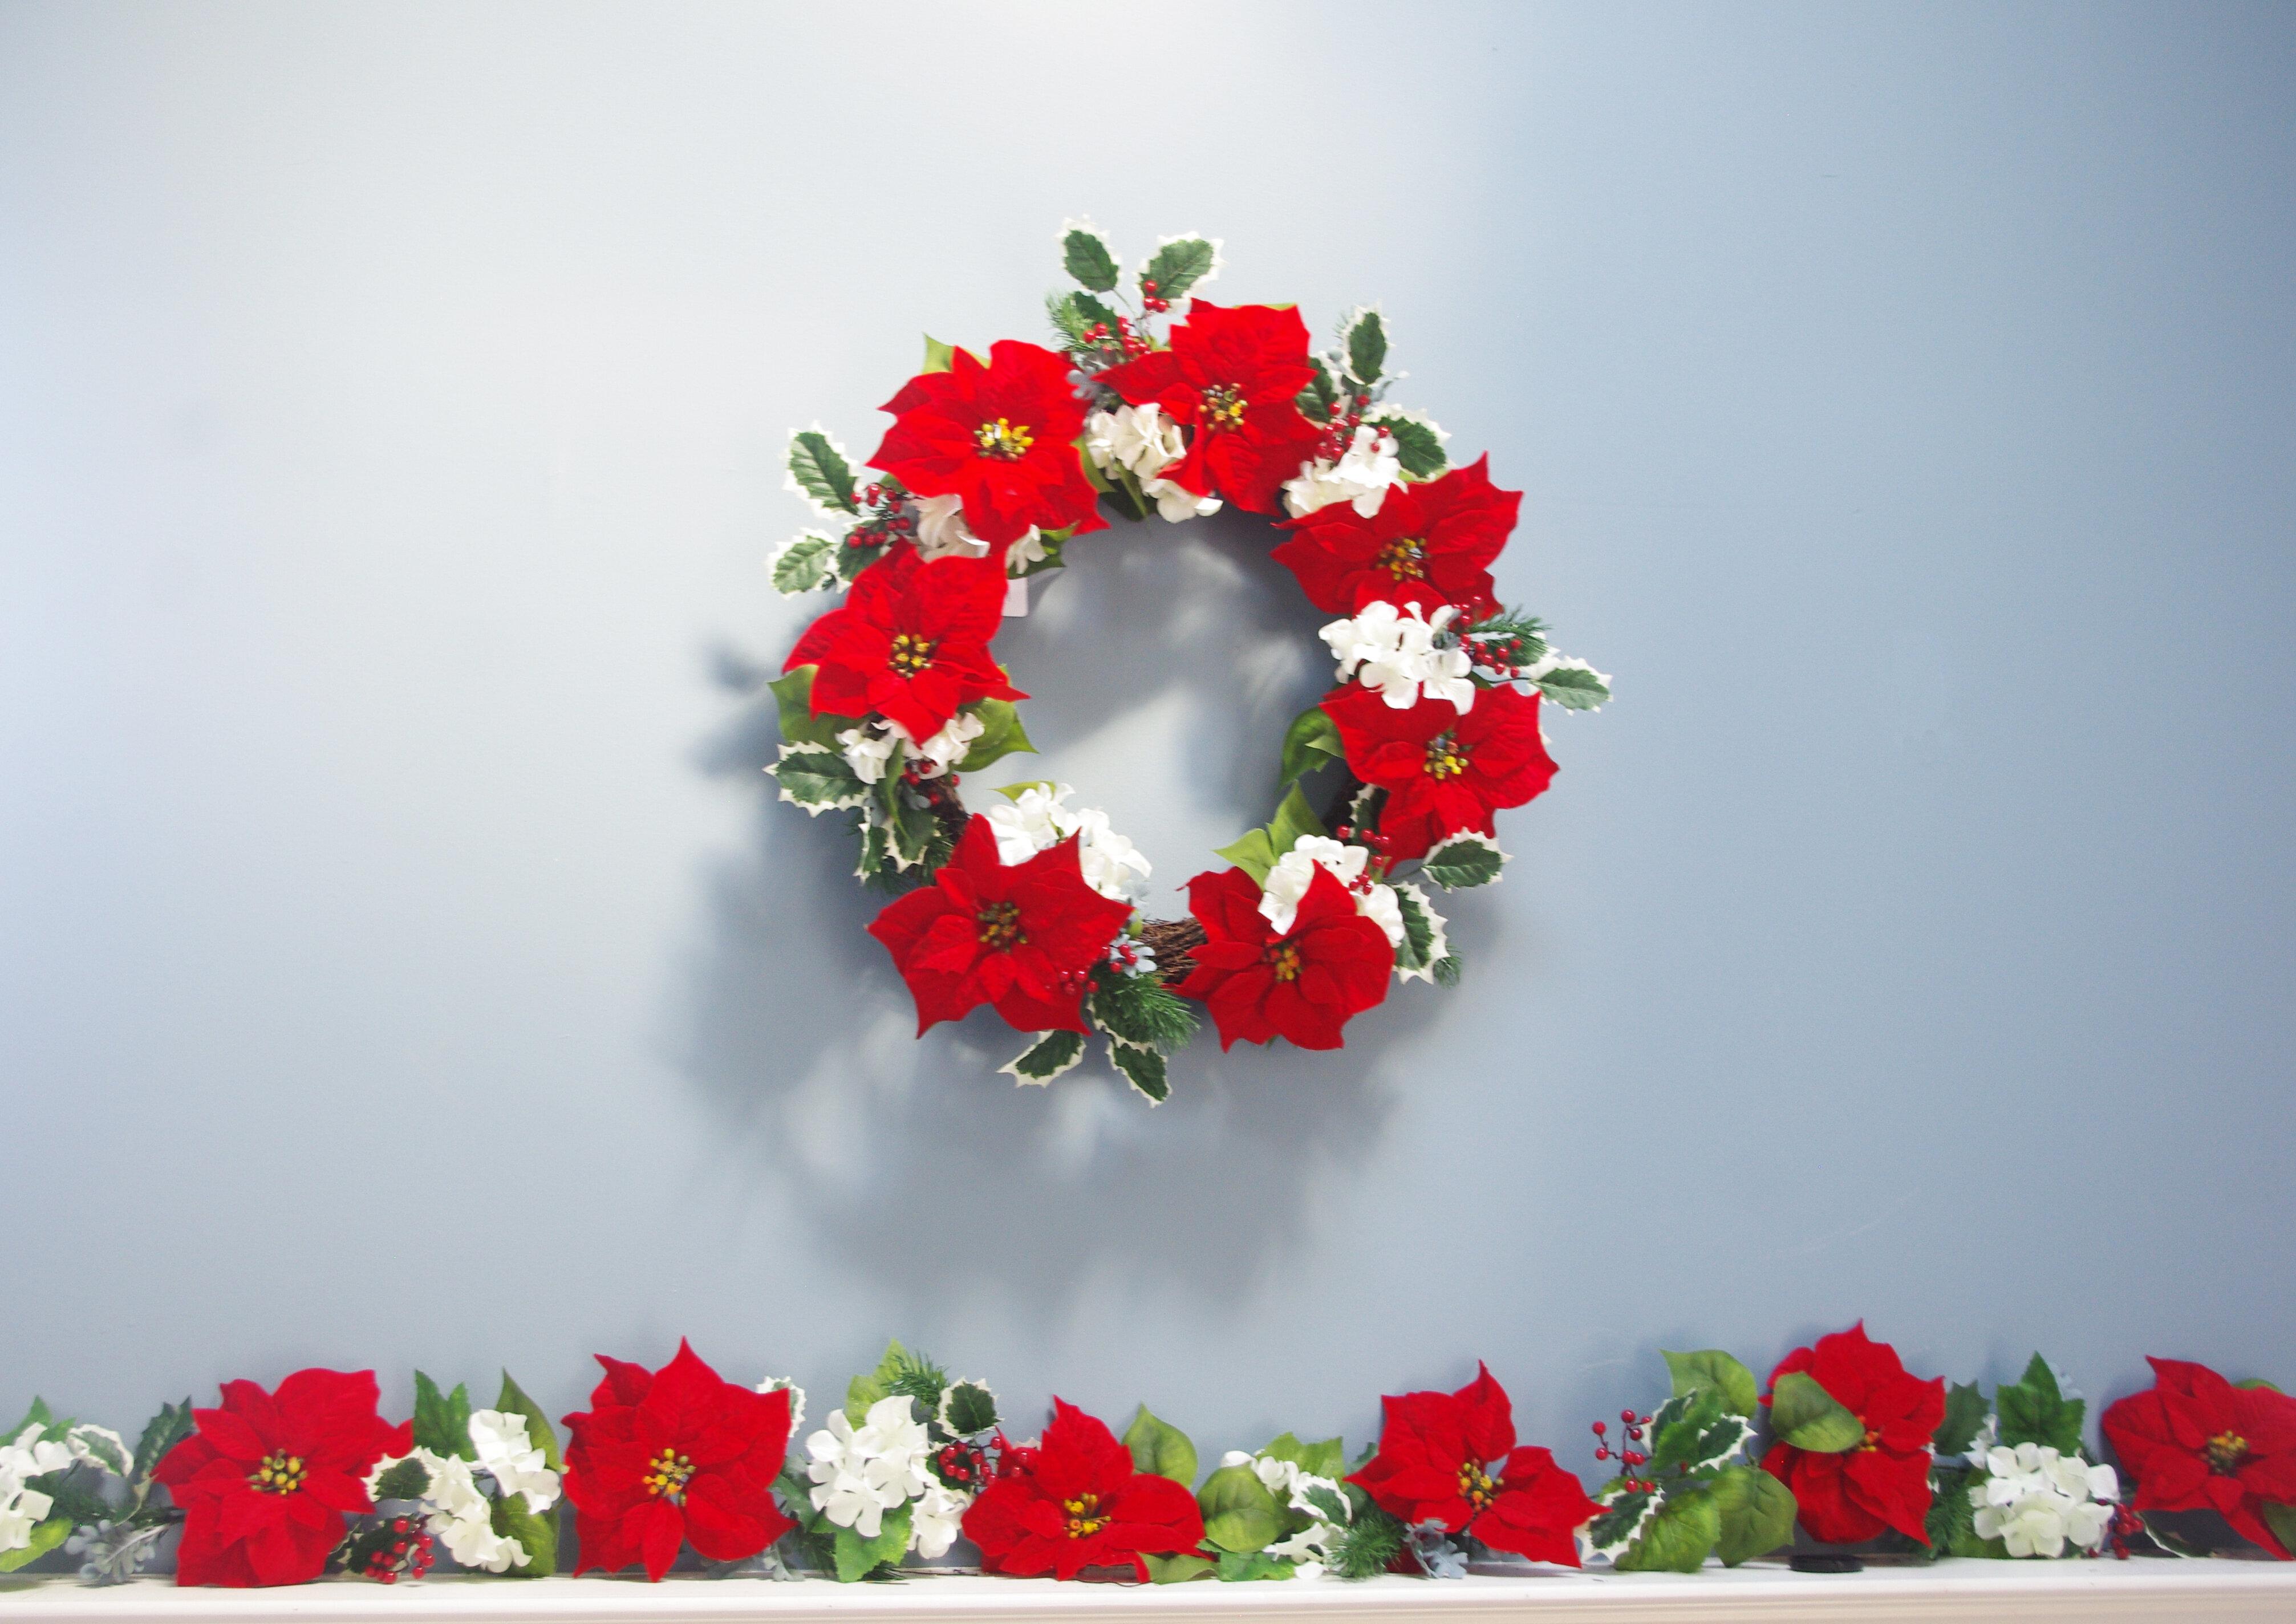 The Holiday Aisle Poinsettia Hydrangea Christmas